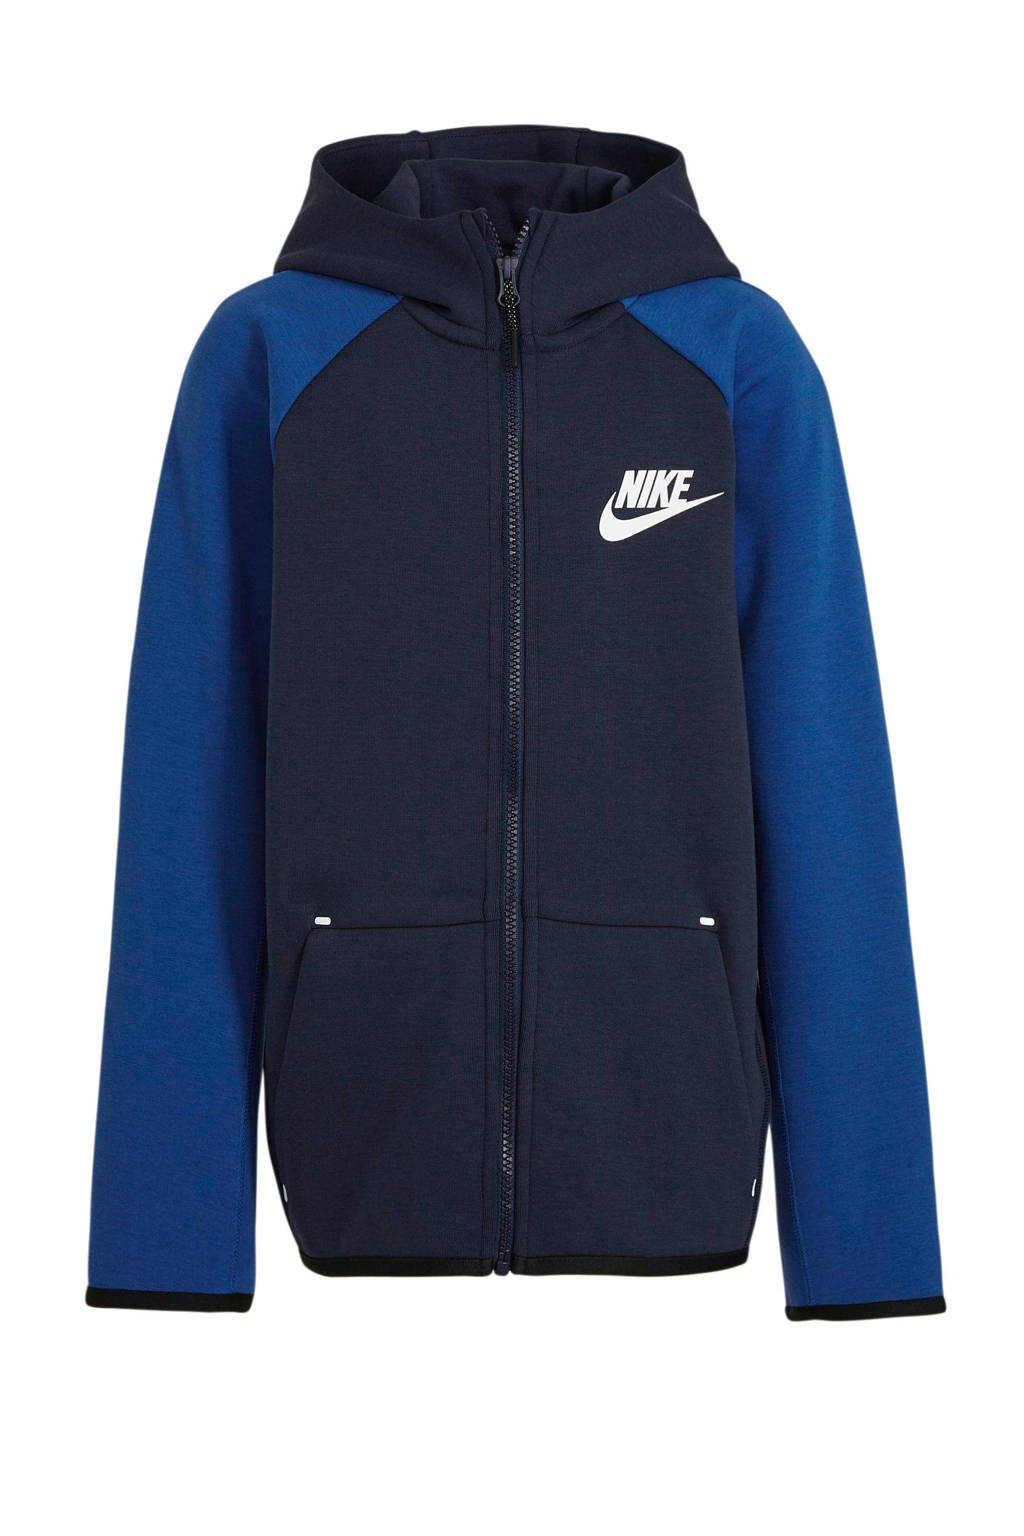 Nike vest donkerblauw, Donkerblauw